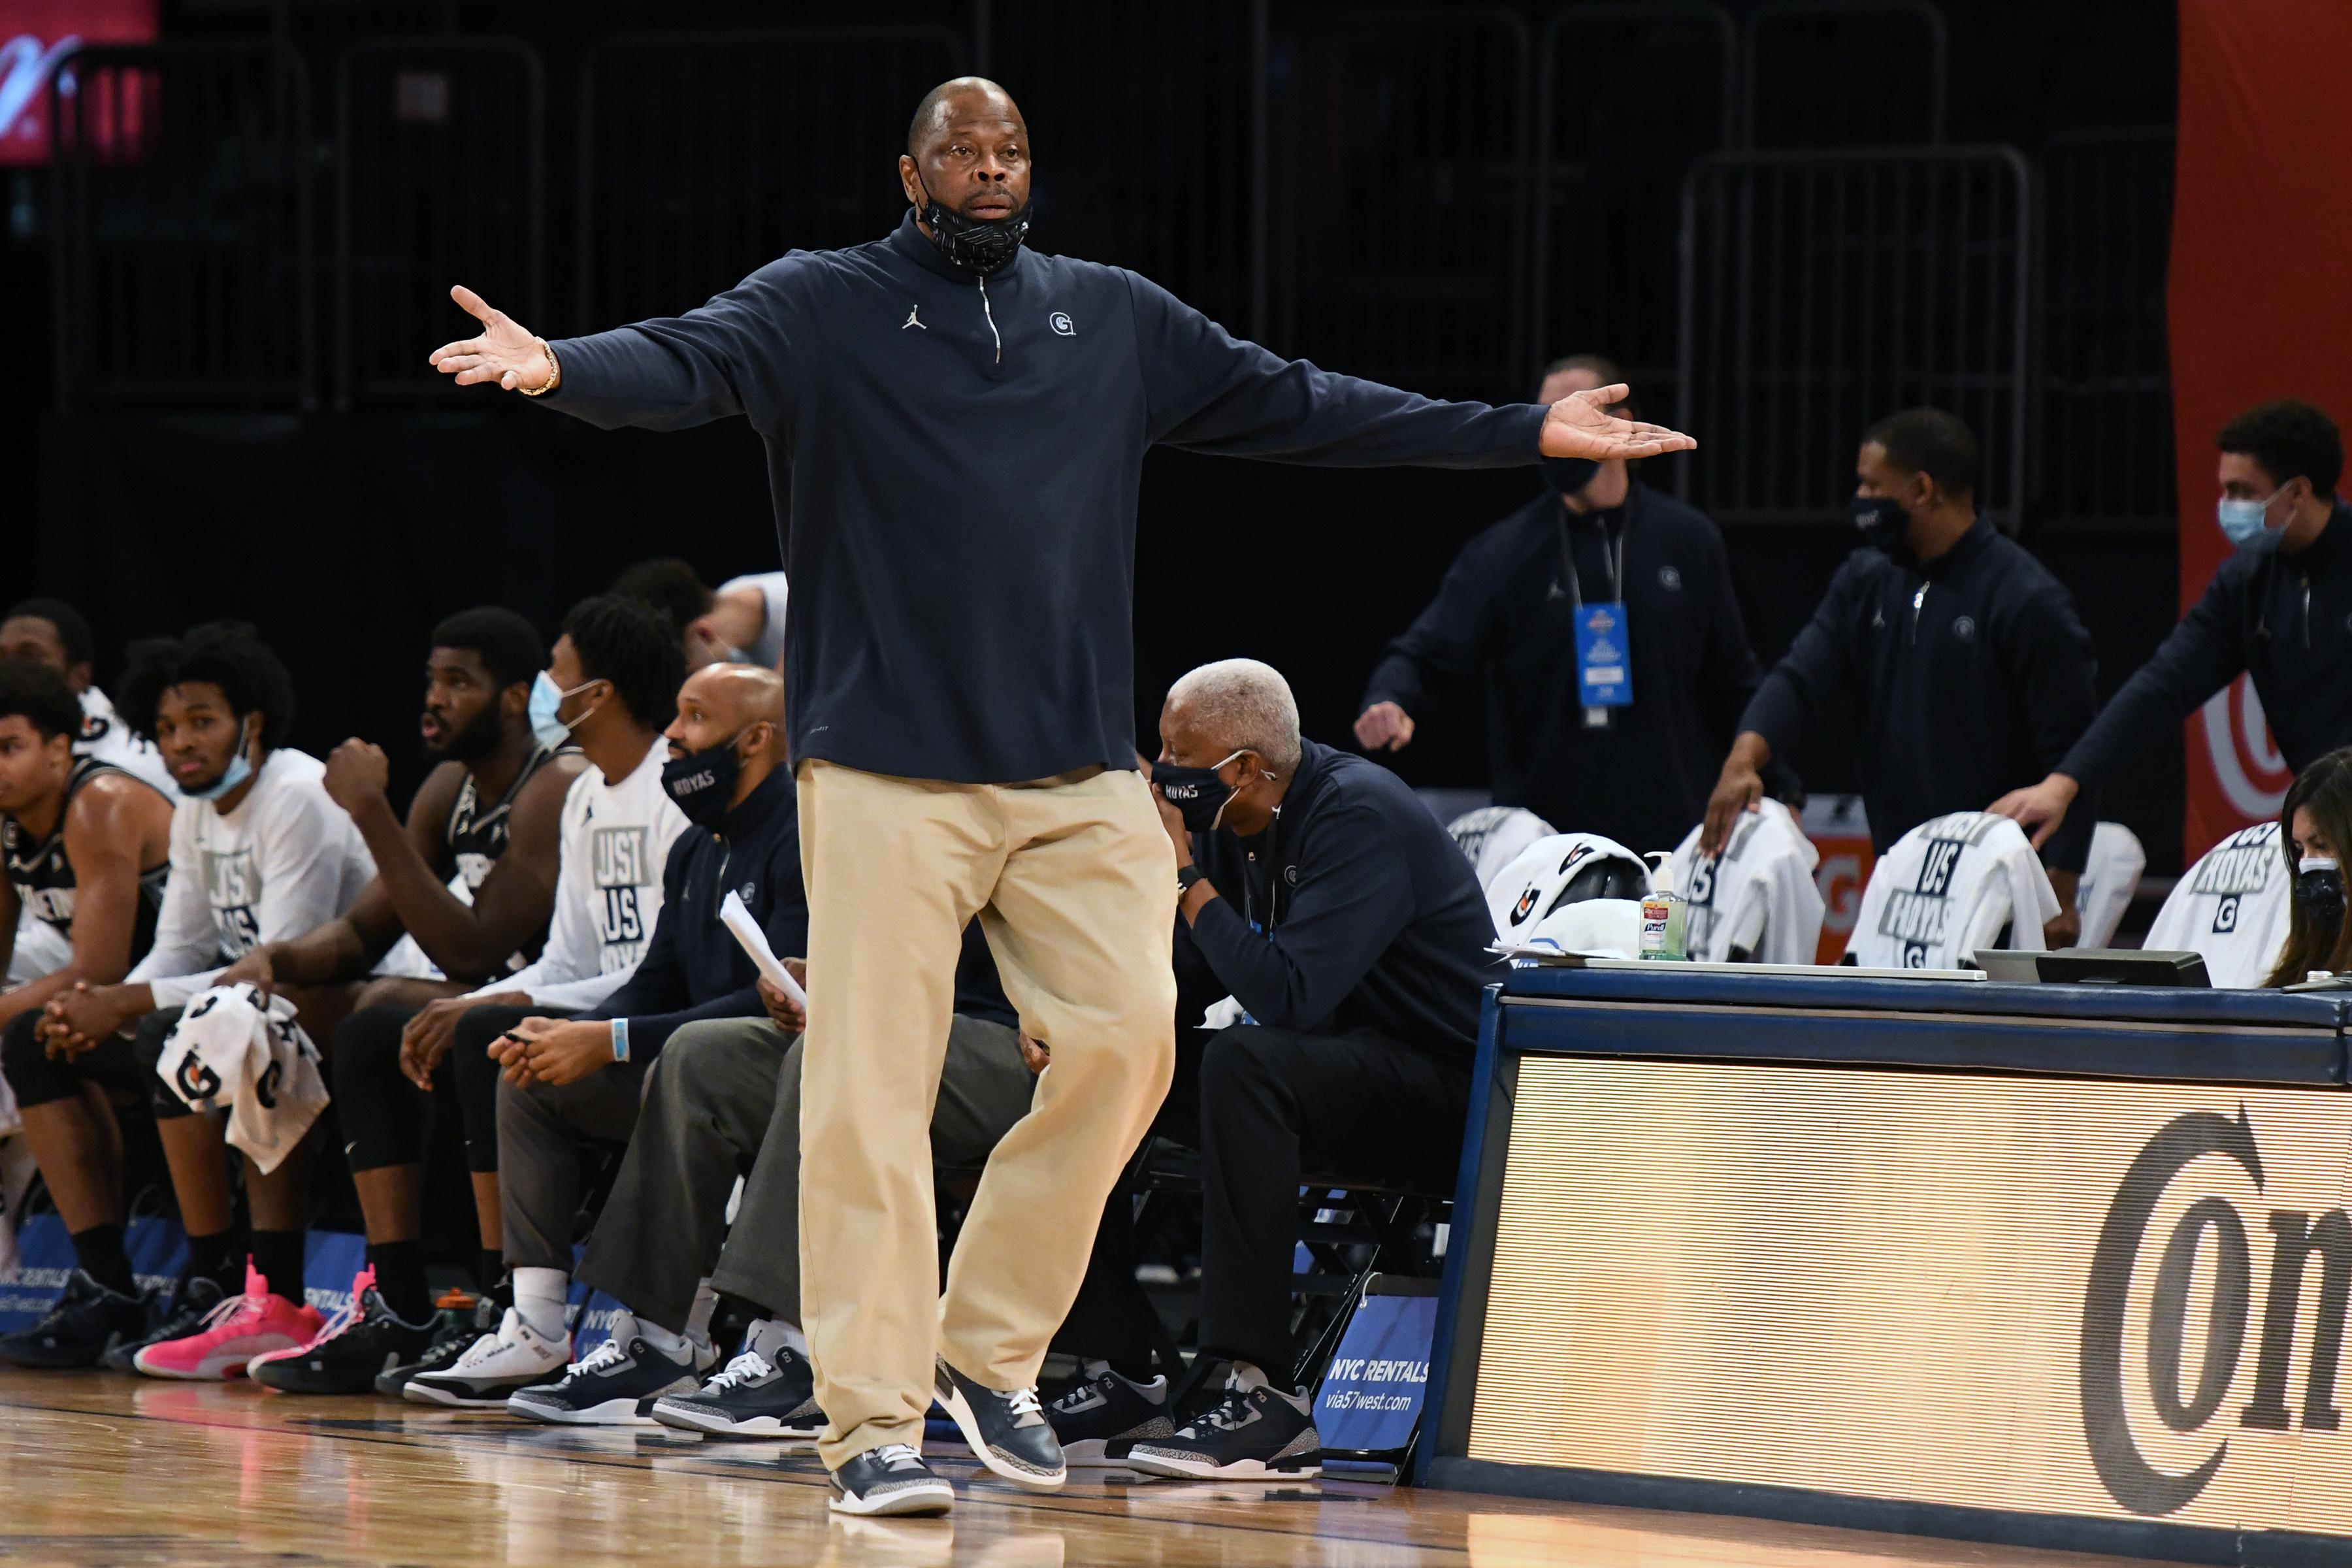 Big East Men's Basketball Tournament - Championship